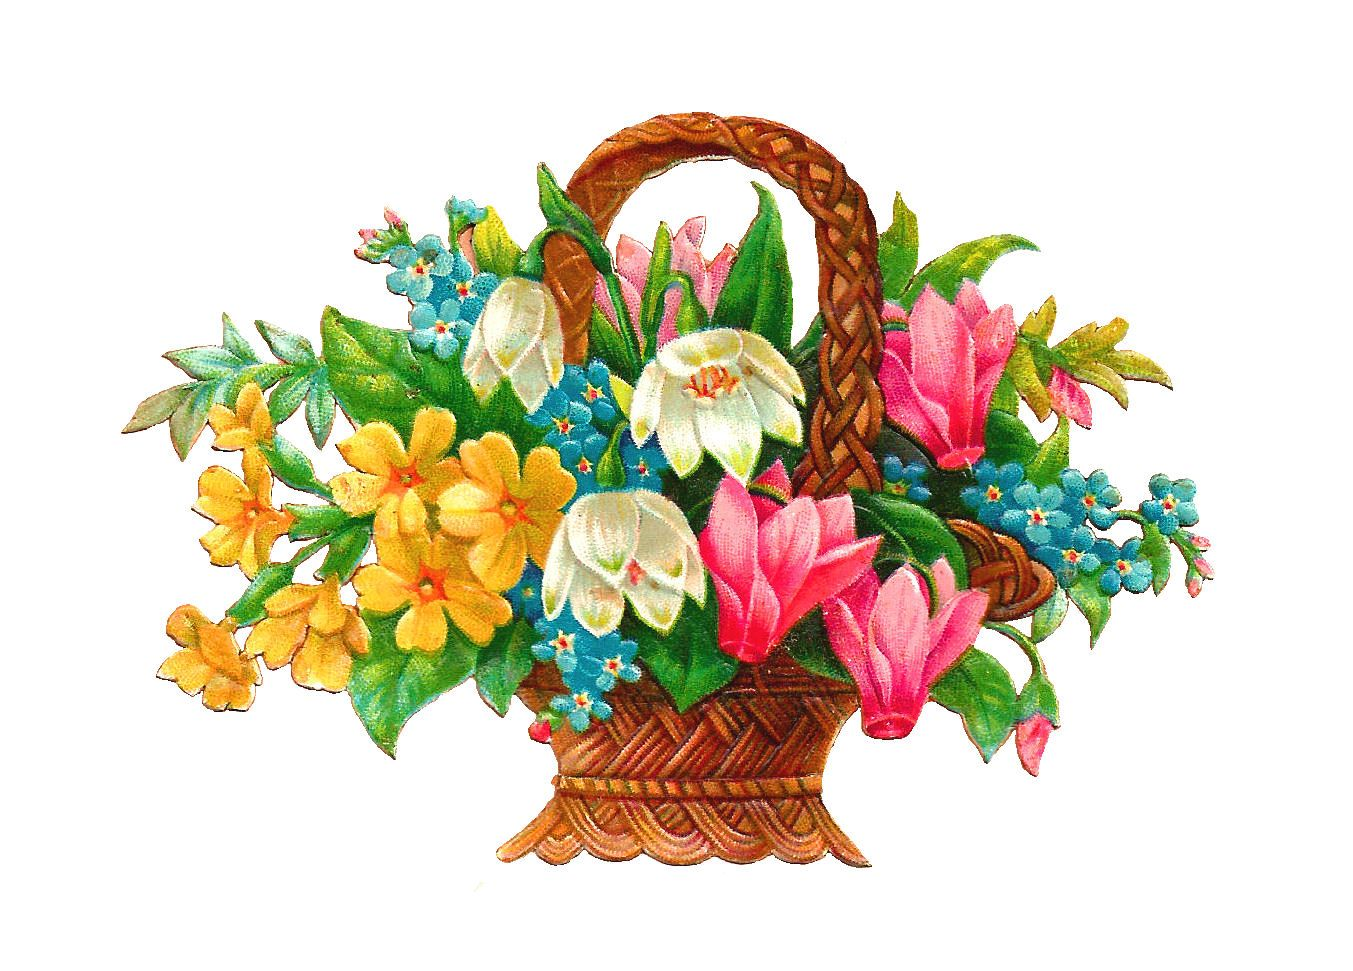 Antique Images: Free Flower Basket Clip Art: 2 Wicket.